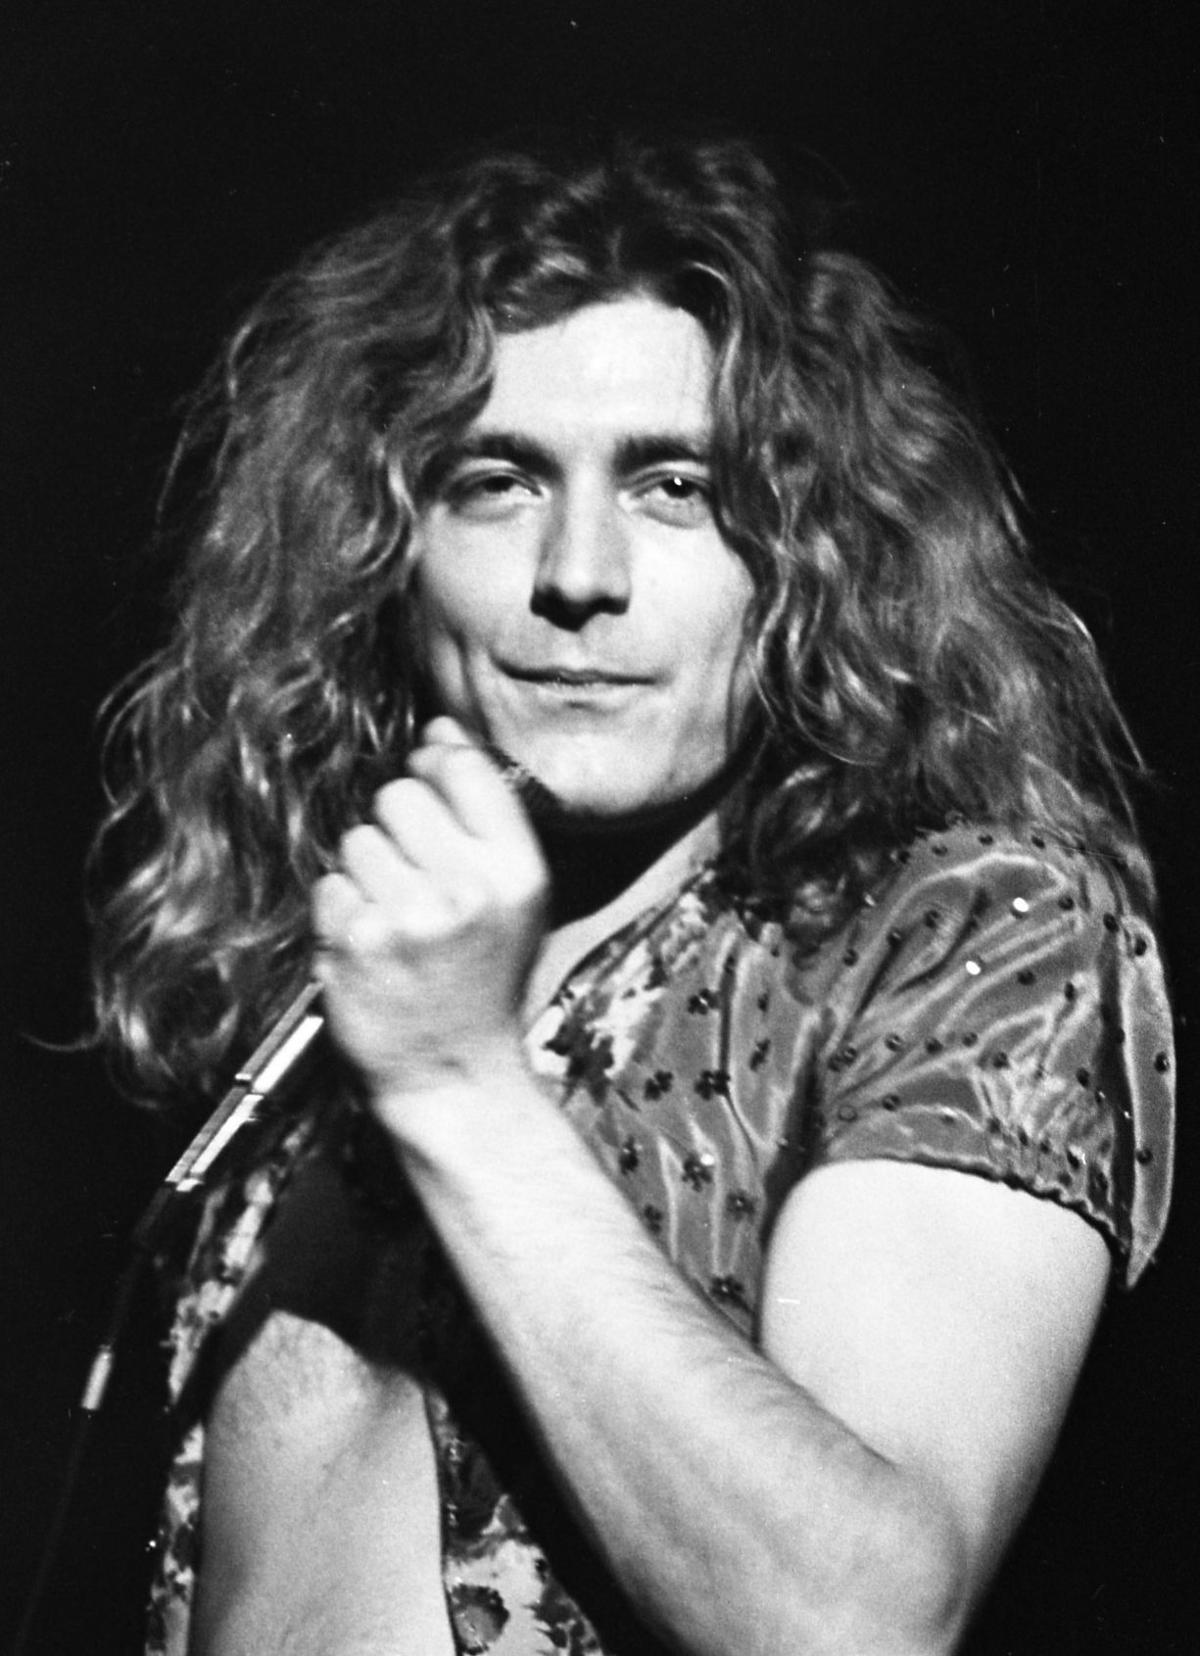 Tucson In The 70s >> Flashback photos: Led Zeppelin in Tucson | Retro Tucson | tucson.com